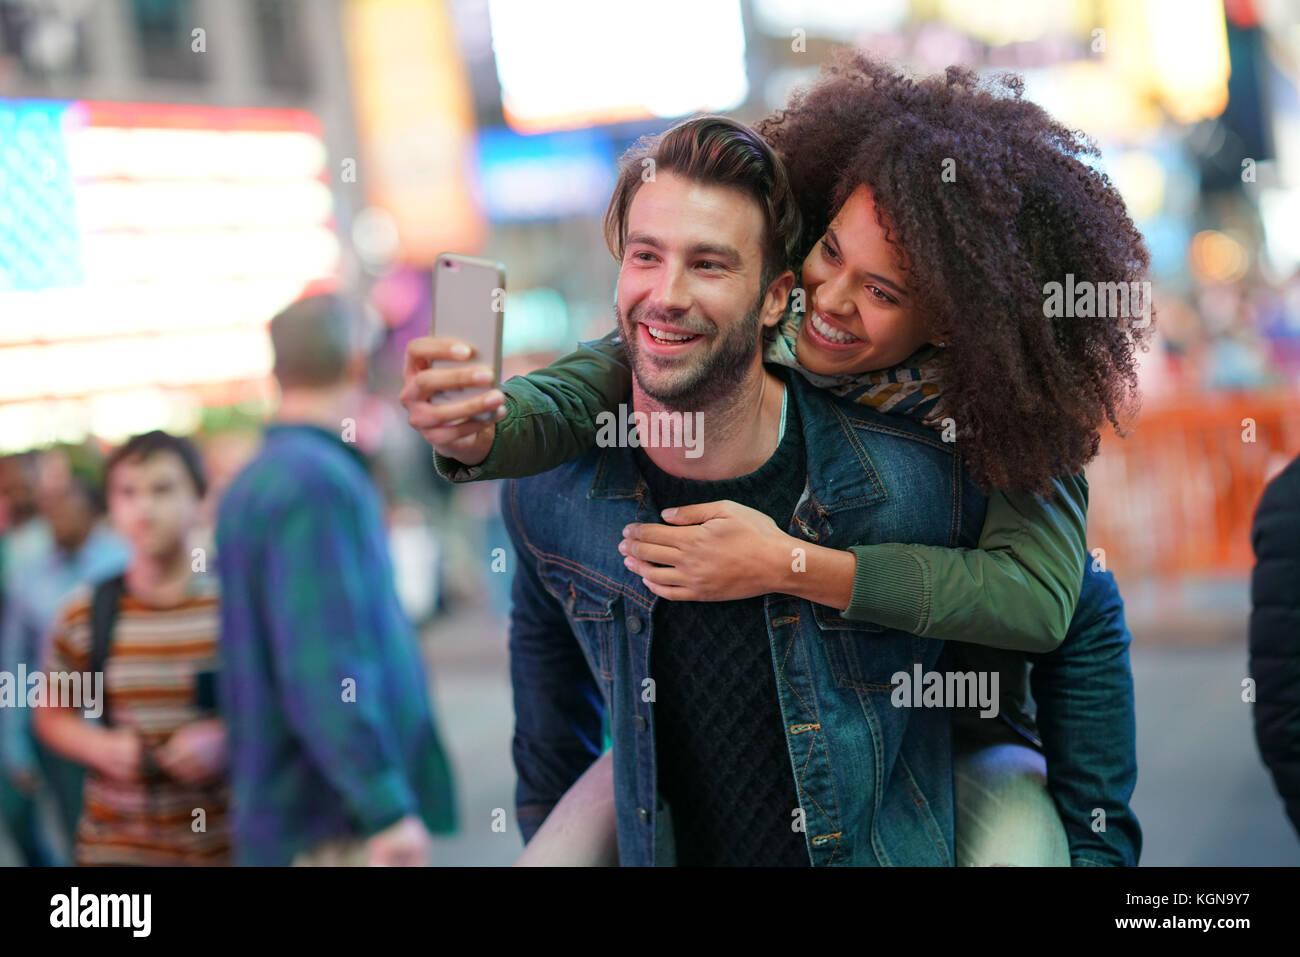 Paar am Times Square nehmen selfie Bild Stockbild